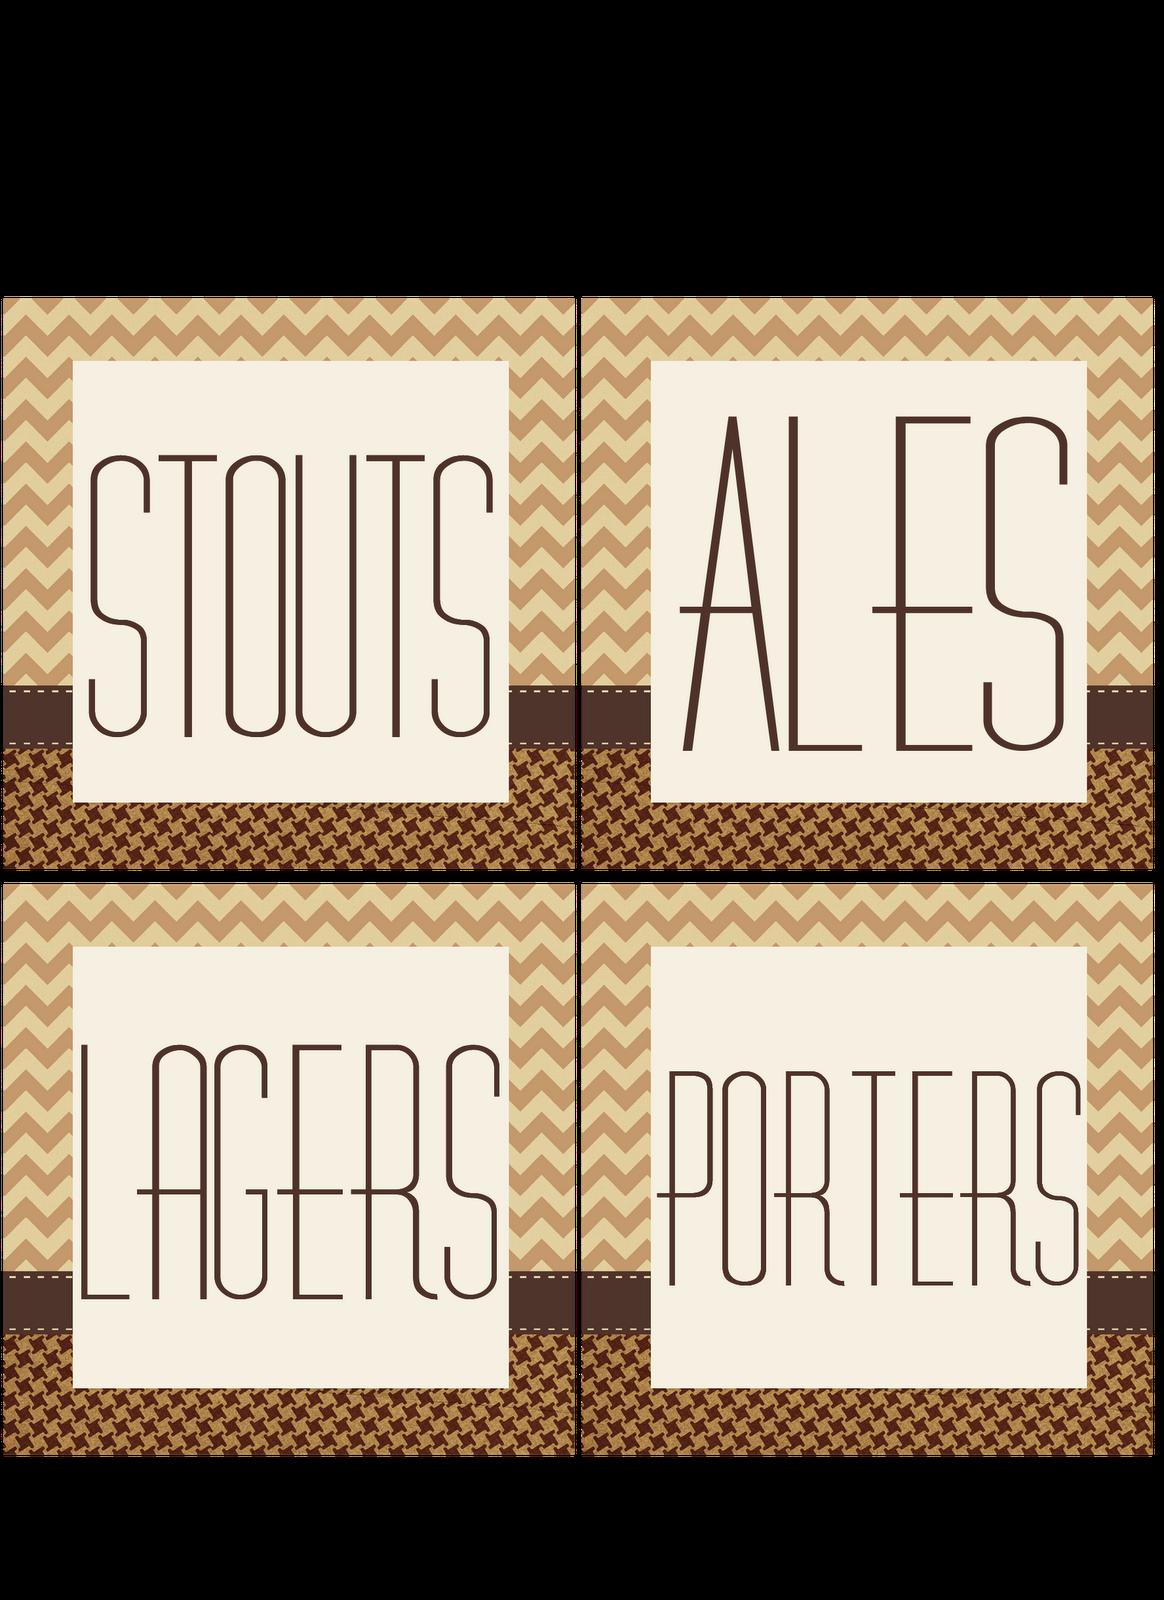 Bringing Home Ezra Free Beer Tasting party printables and ideas – Beer Tasting Party Invitations